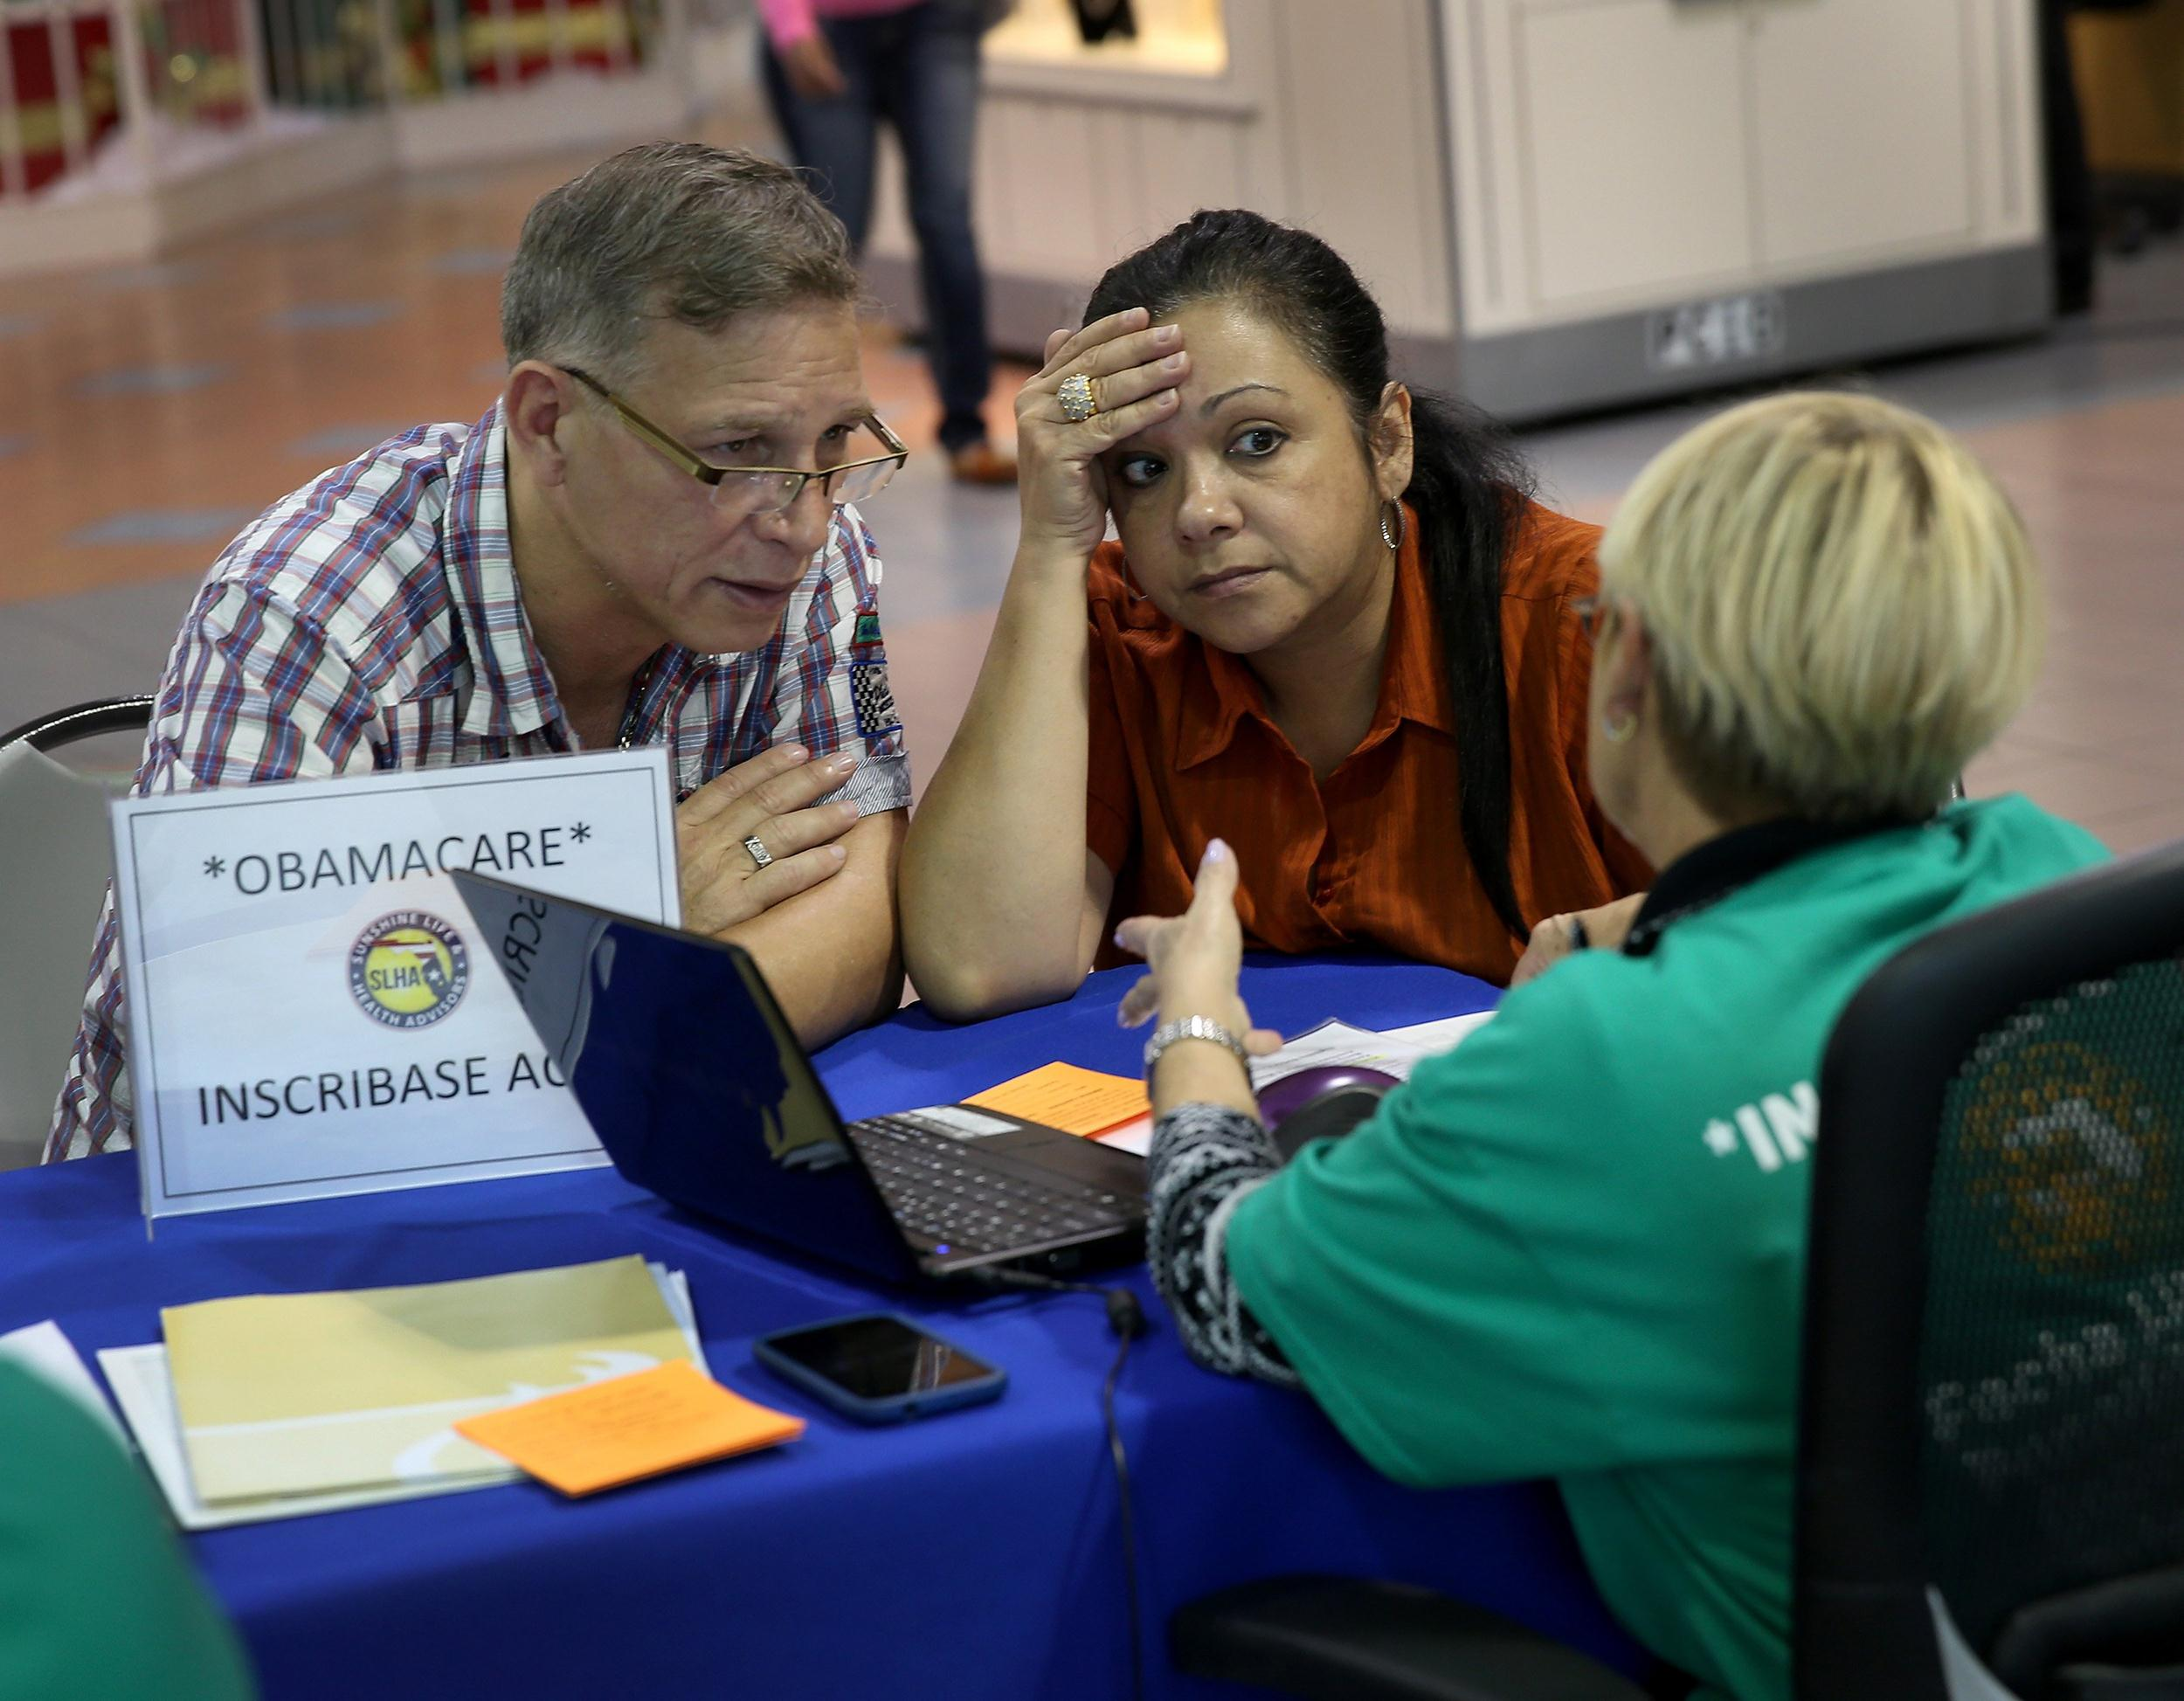 Image: Affordable Care Act Fair Draws Floridians As Enrollmnent Deadline Looms